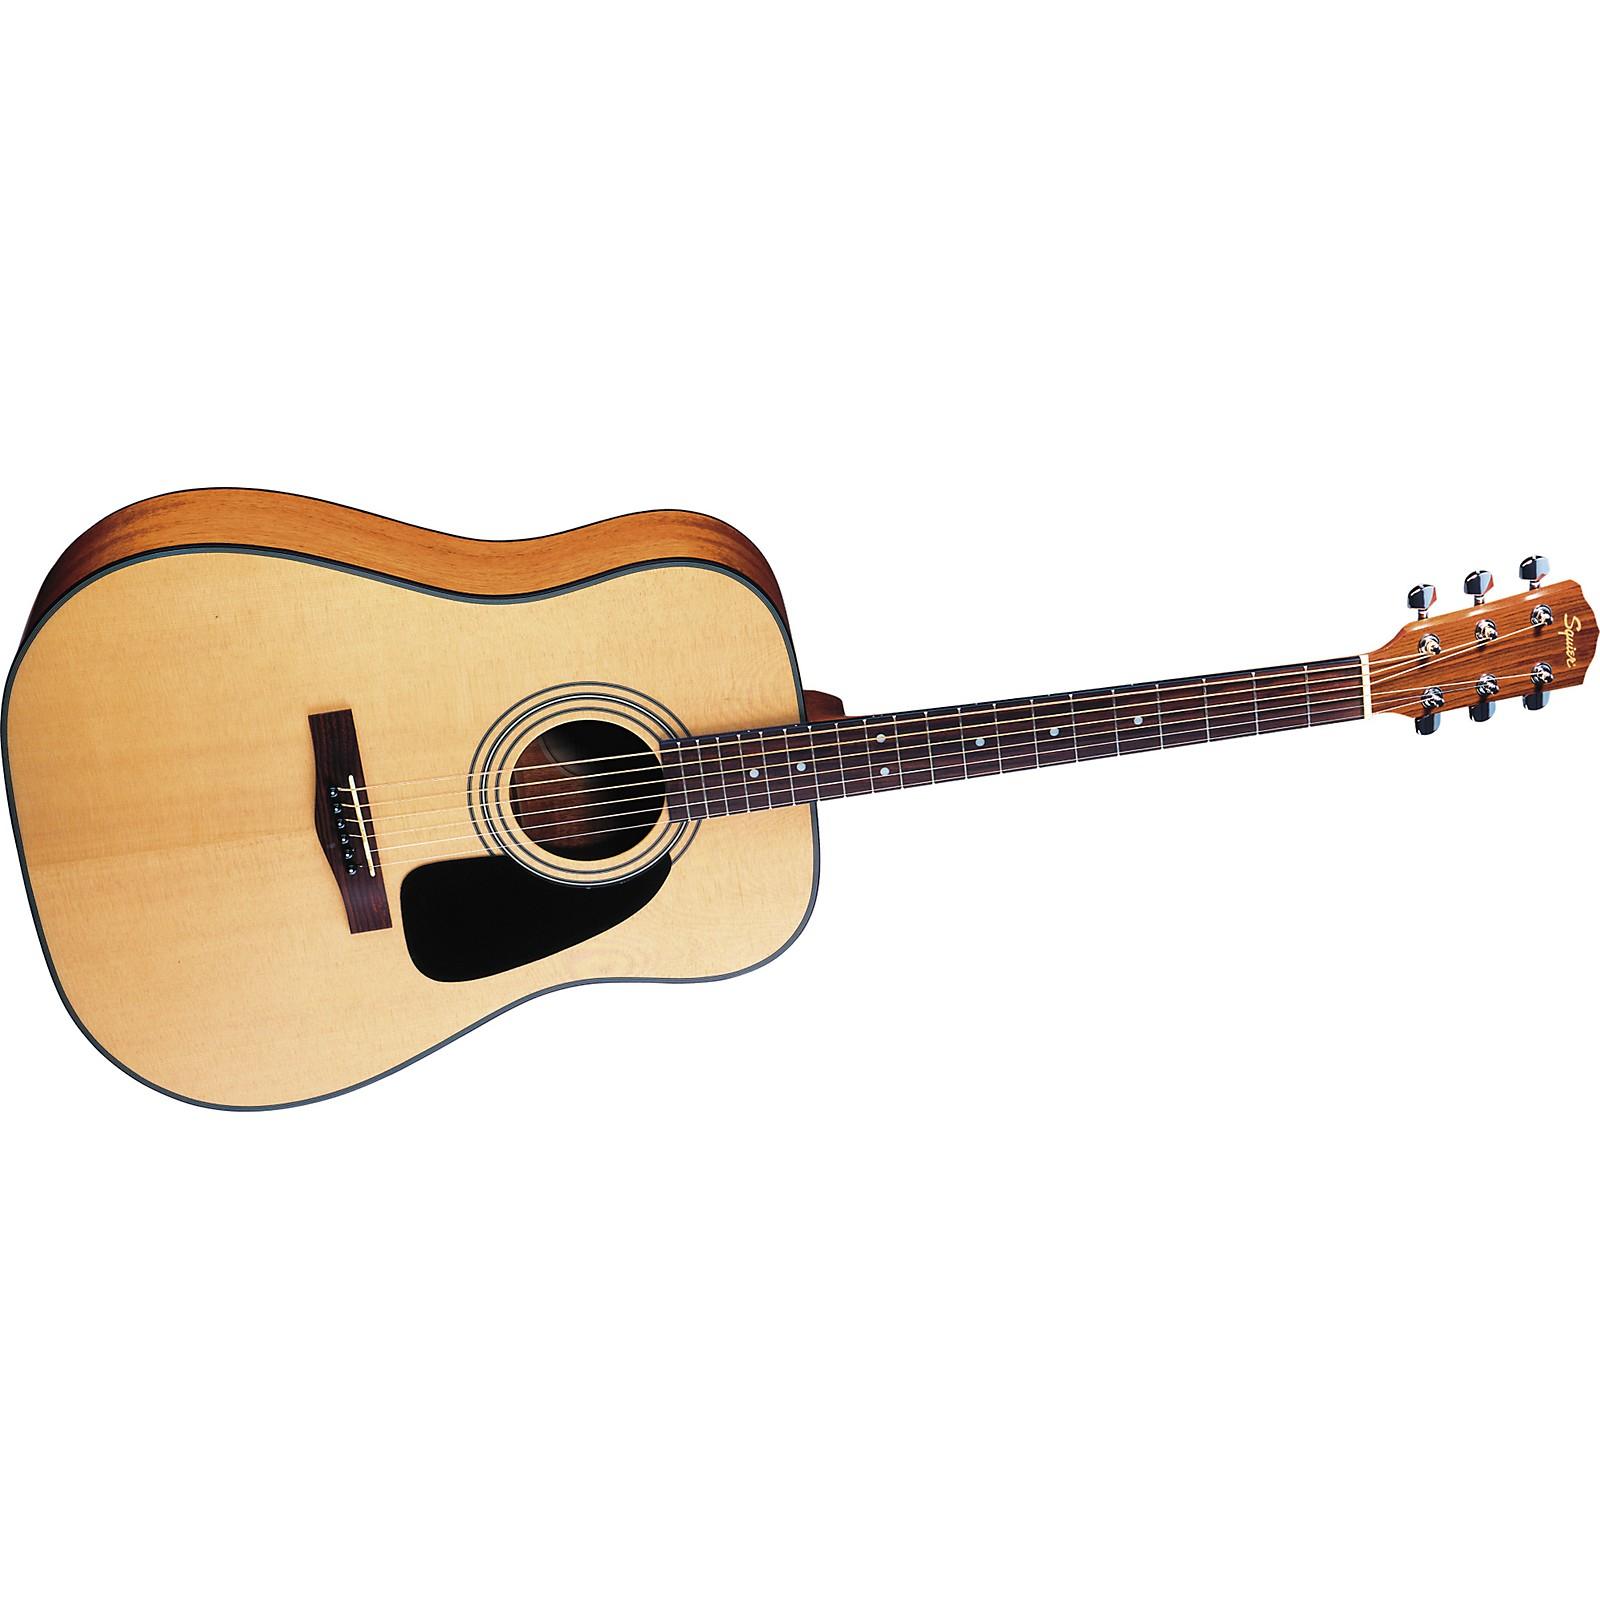 Squier SD-6 Dreadnought Acoustic Guitar